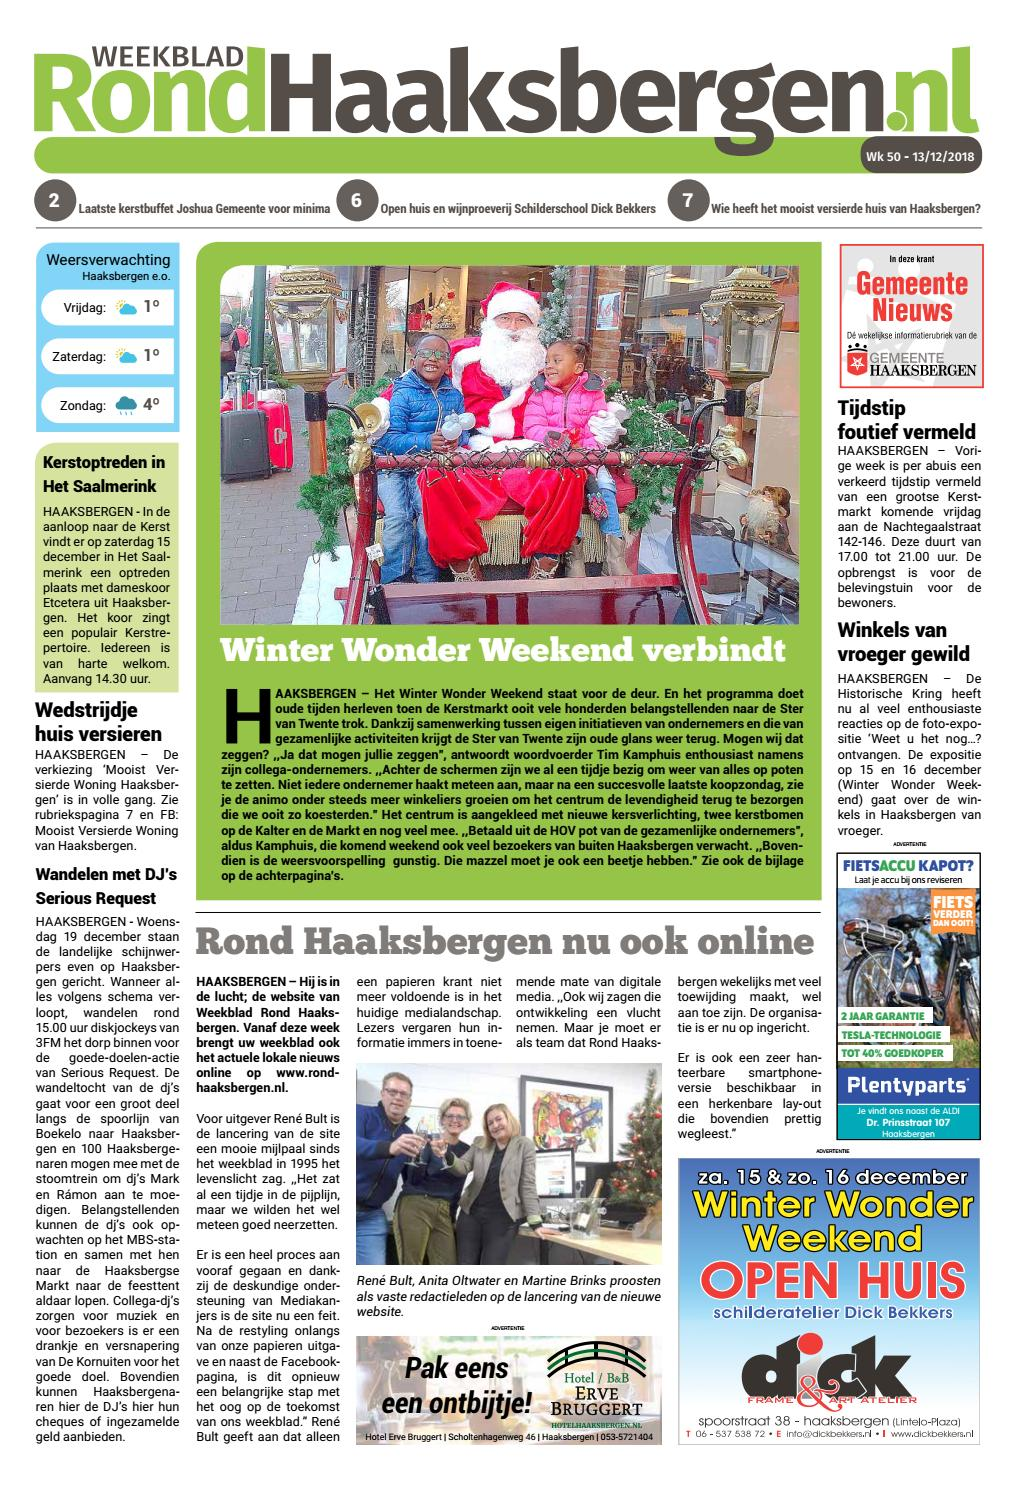 Weekblad By Rond Roha2018 wk50 Issuu Haaksbergen 453ARLj